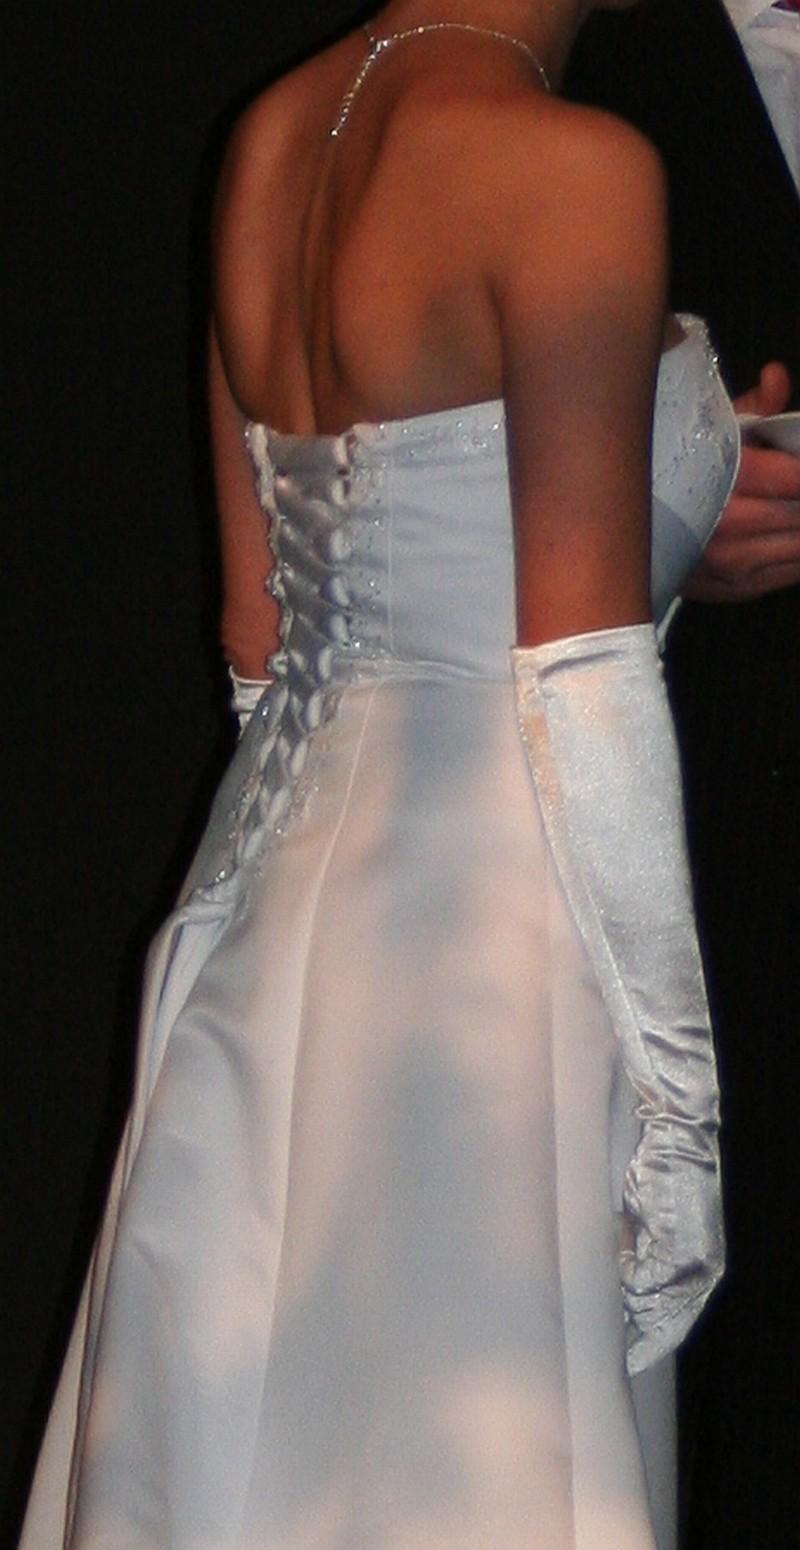 Ellen h second hand wedding dress on sale 77 off for Second hand wedding dresses san diego